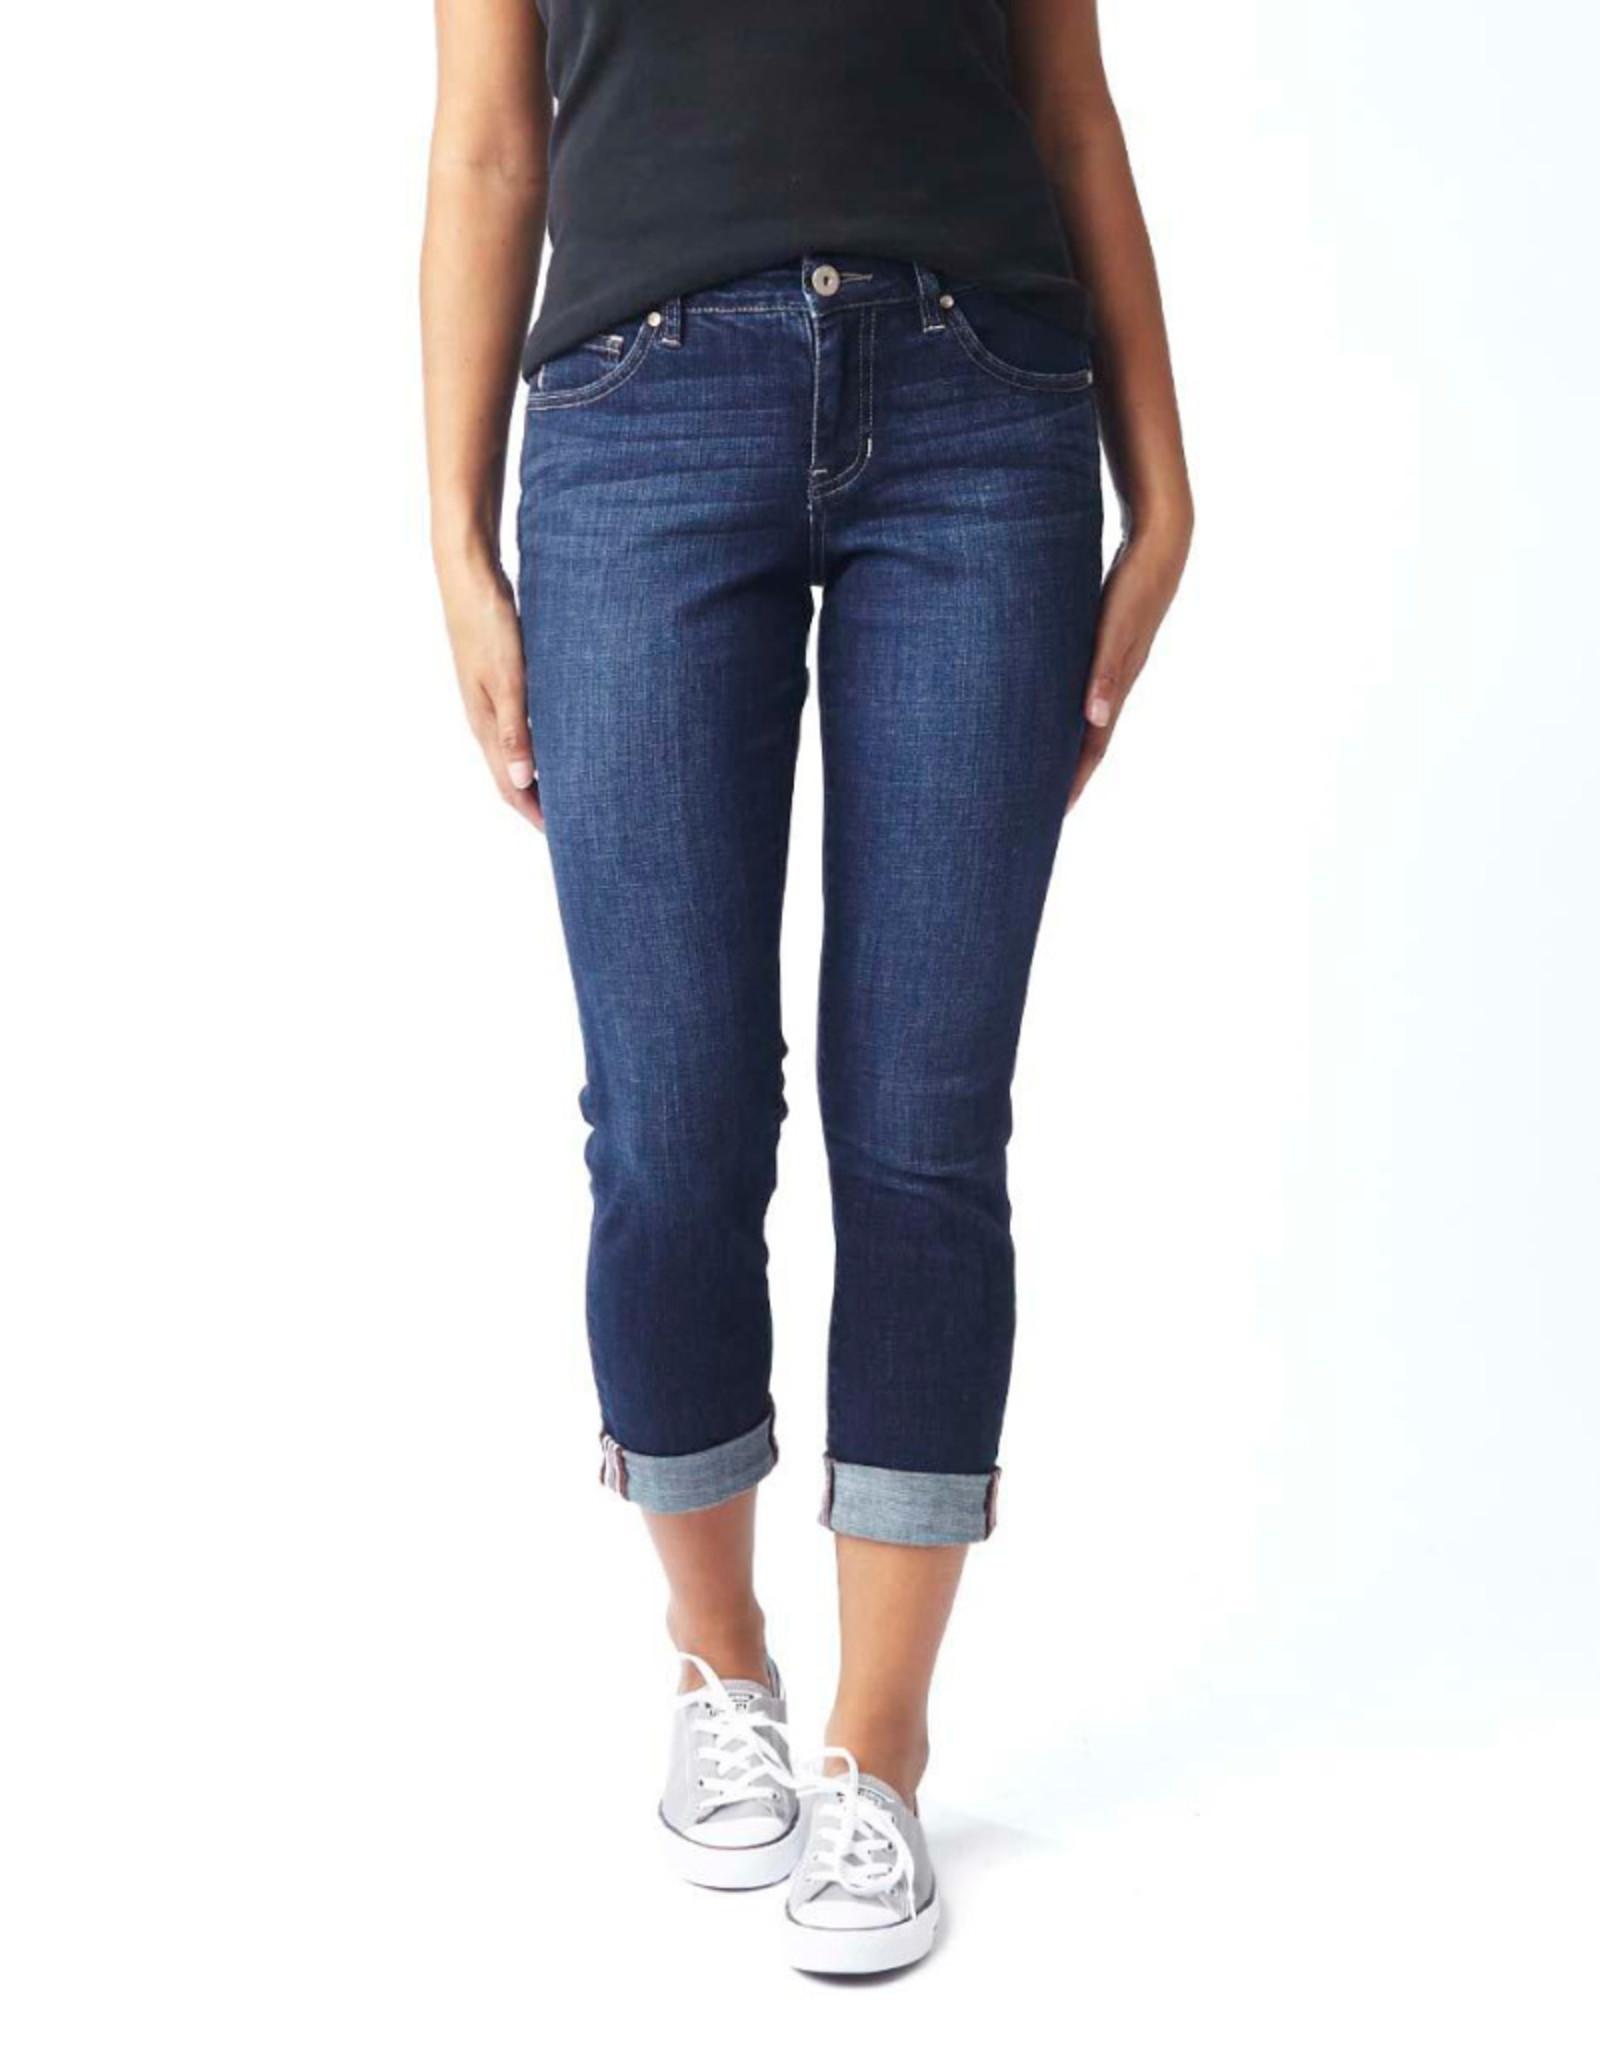 Jag JAG Carter Girlfriend Jeans